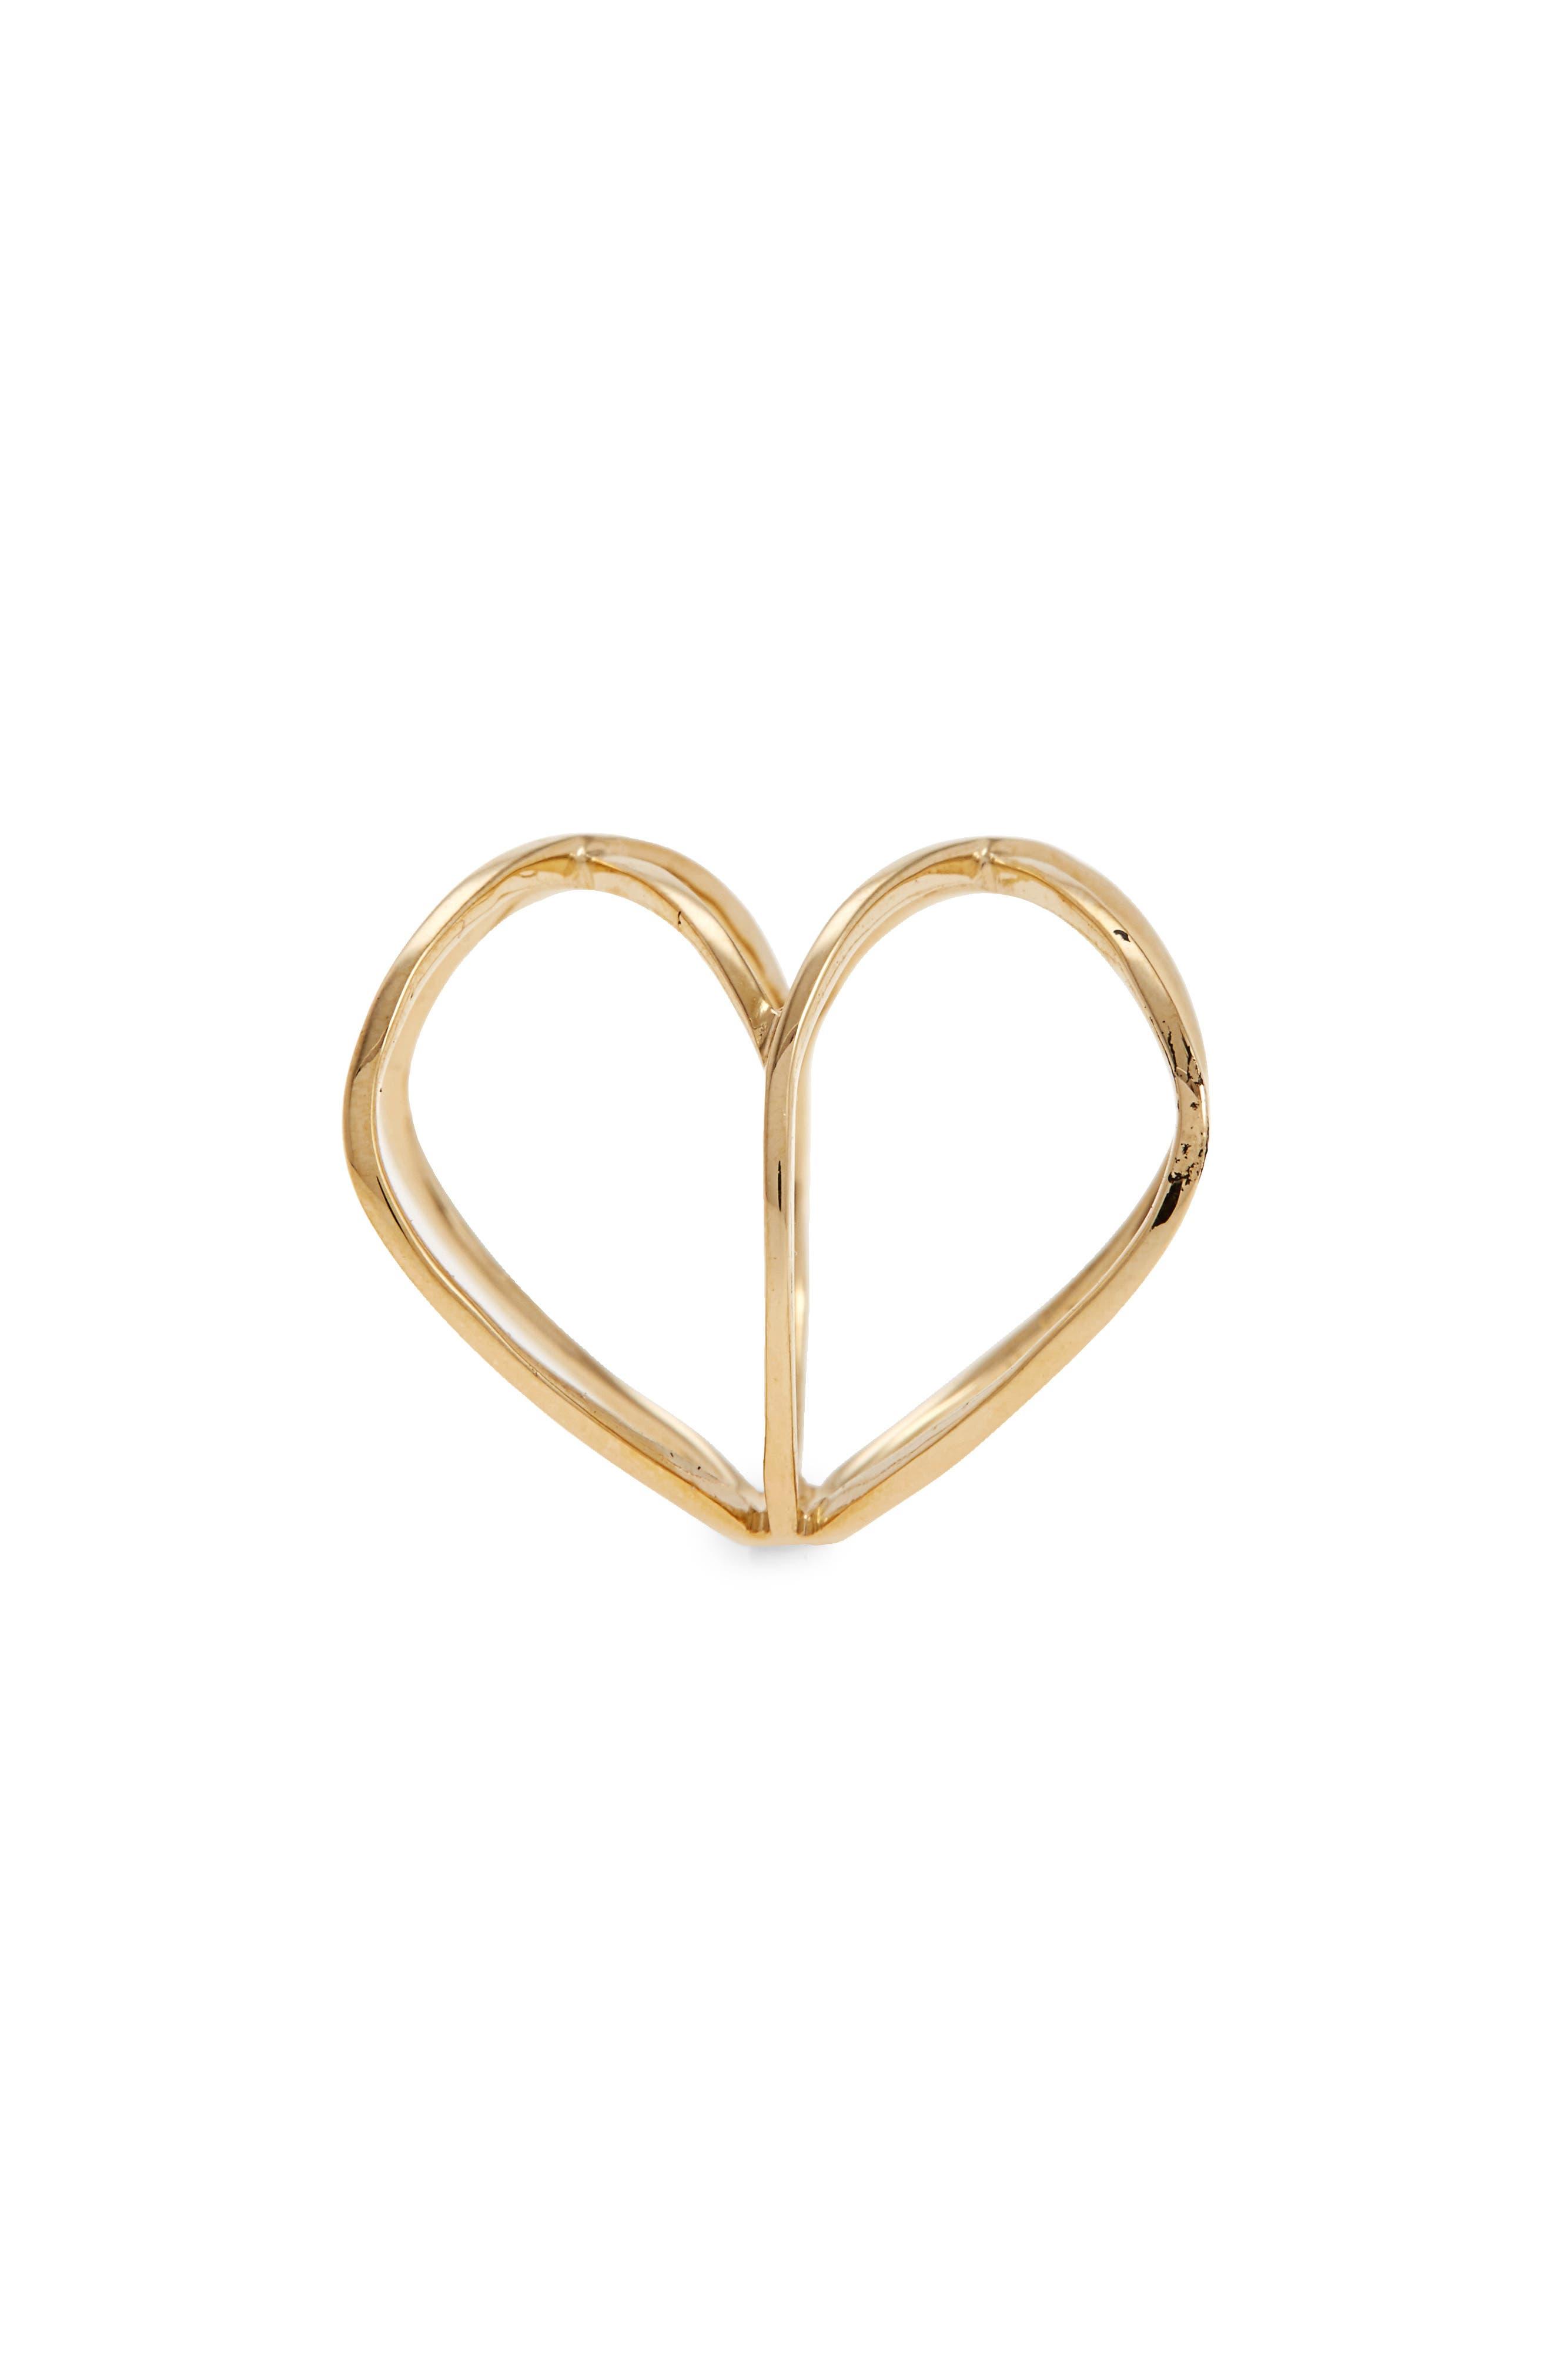 14KT Double Crisscross Ring,                             Alternate thumbnail 3, color,                             YELLOW GOLD